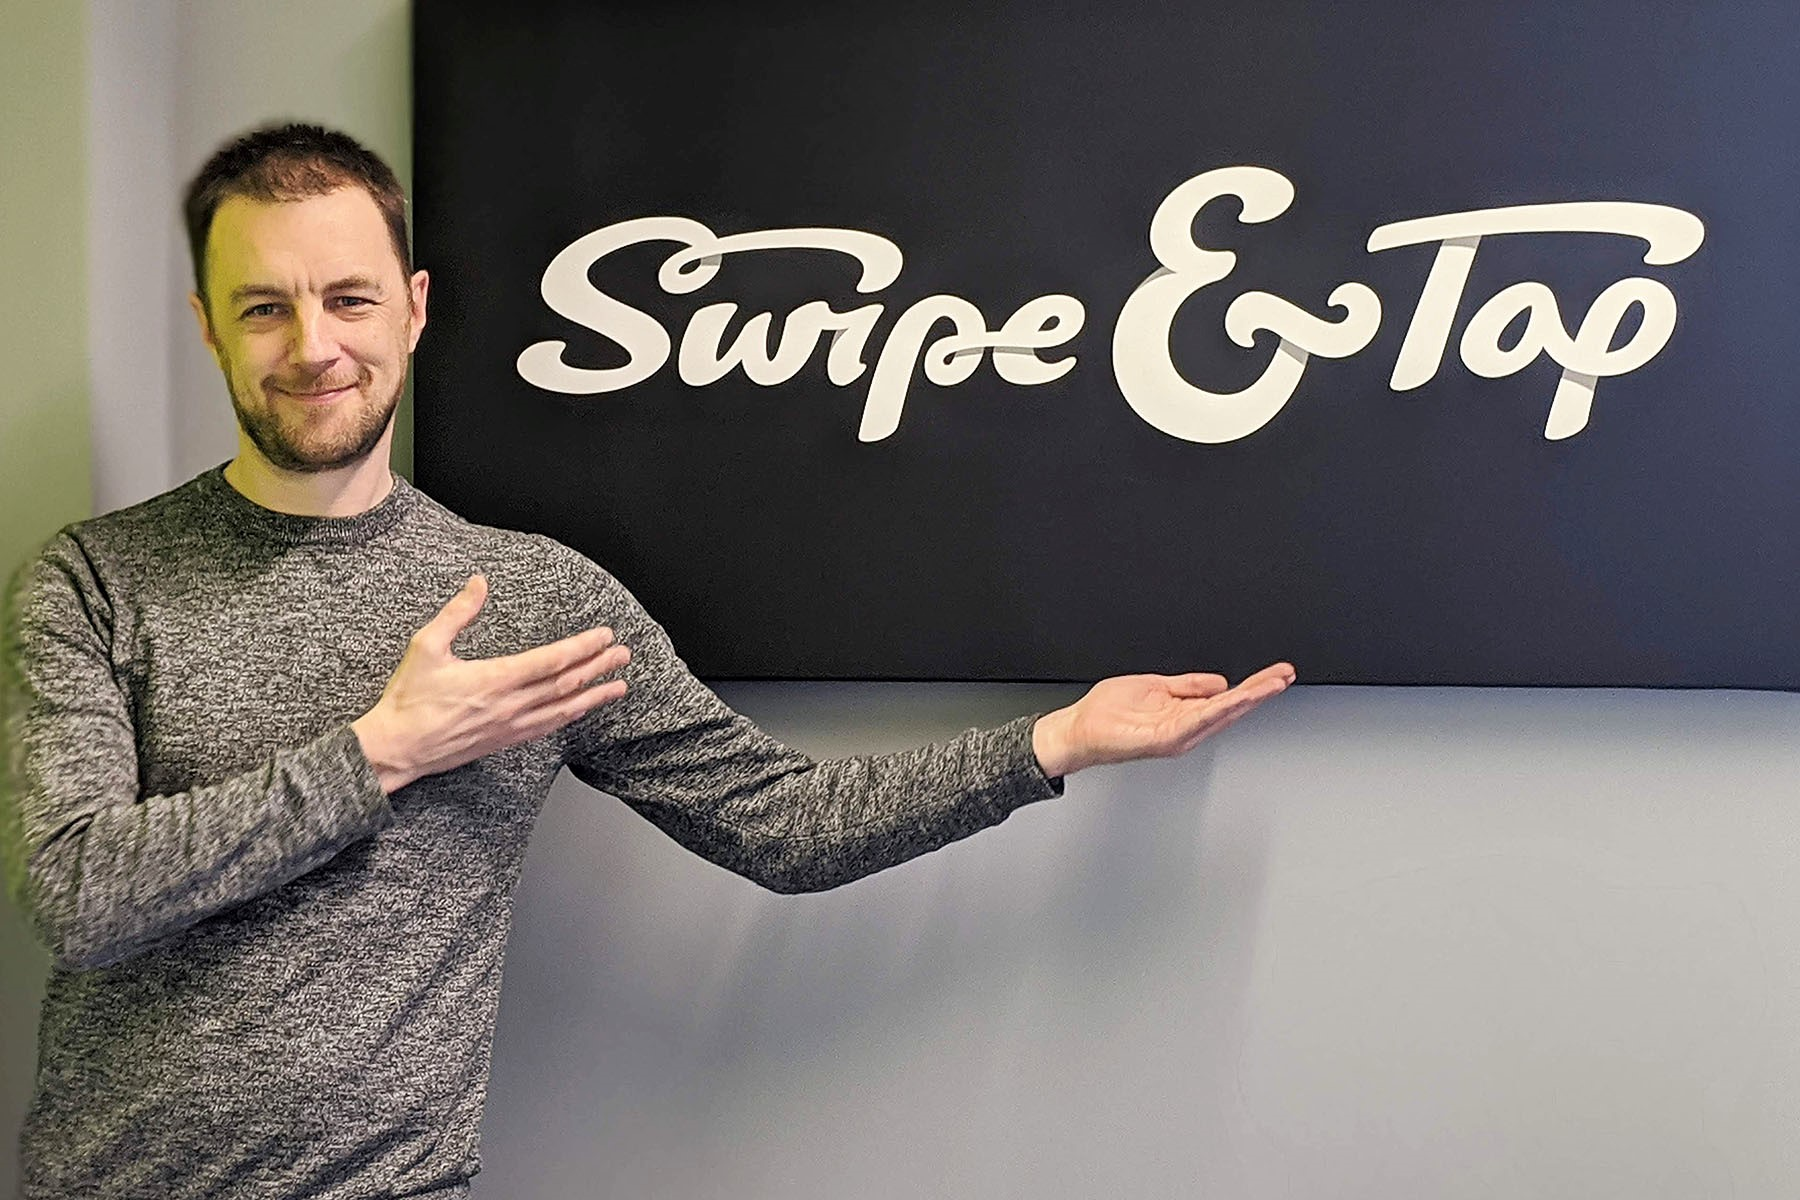 swipe & type